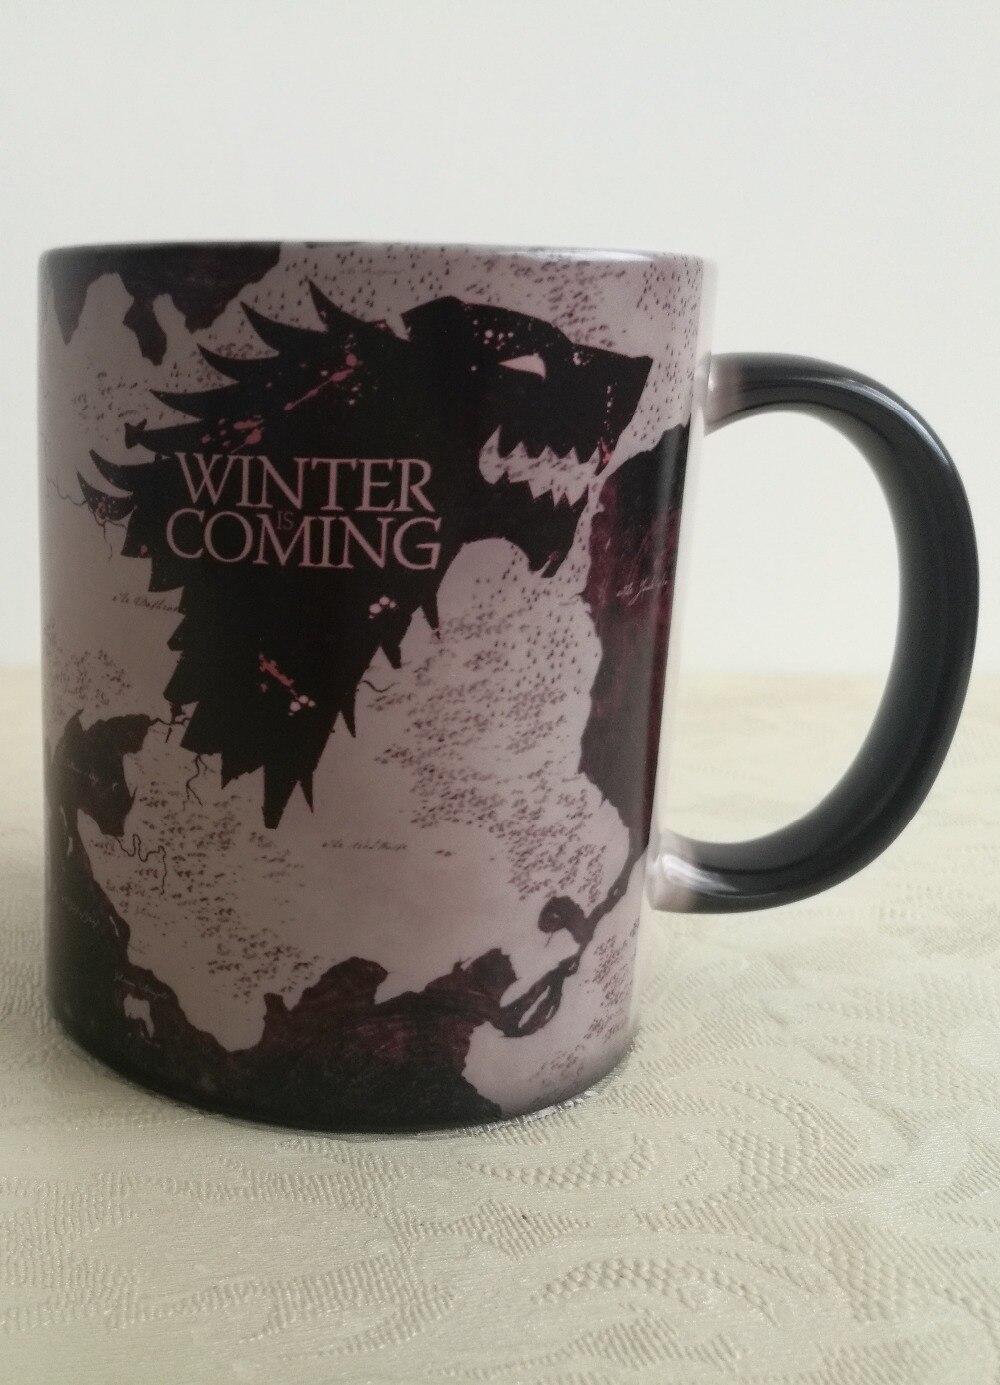 Original Game Of Thrones mugs heat changing color coffee mugs magic Tea mugen home decal kitchen porcelain tea beer travel